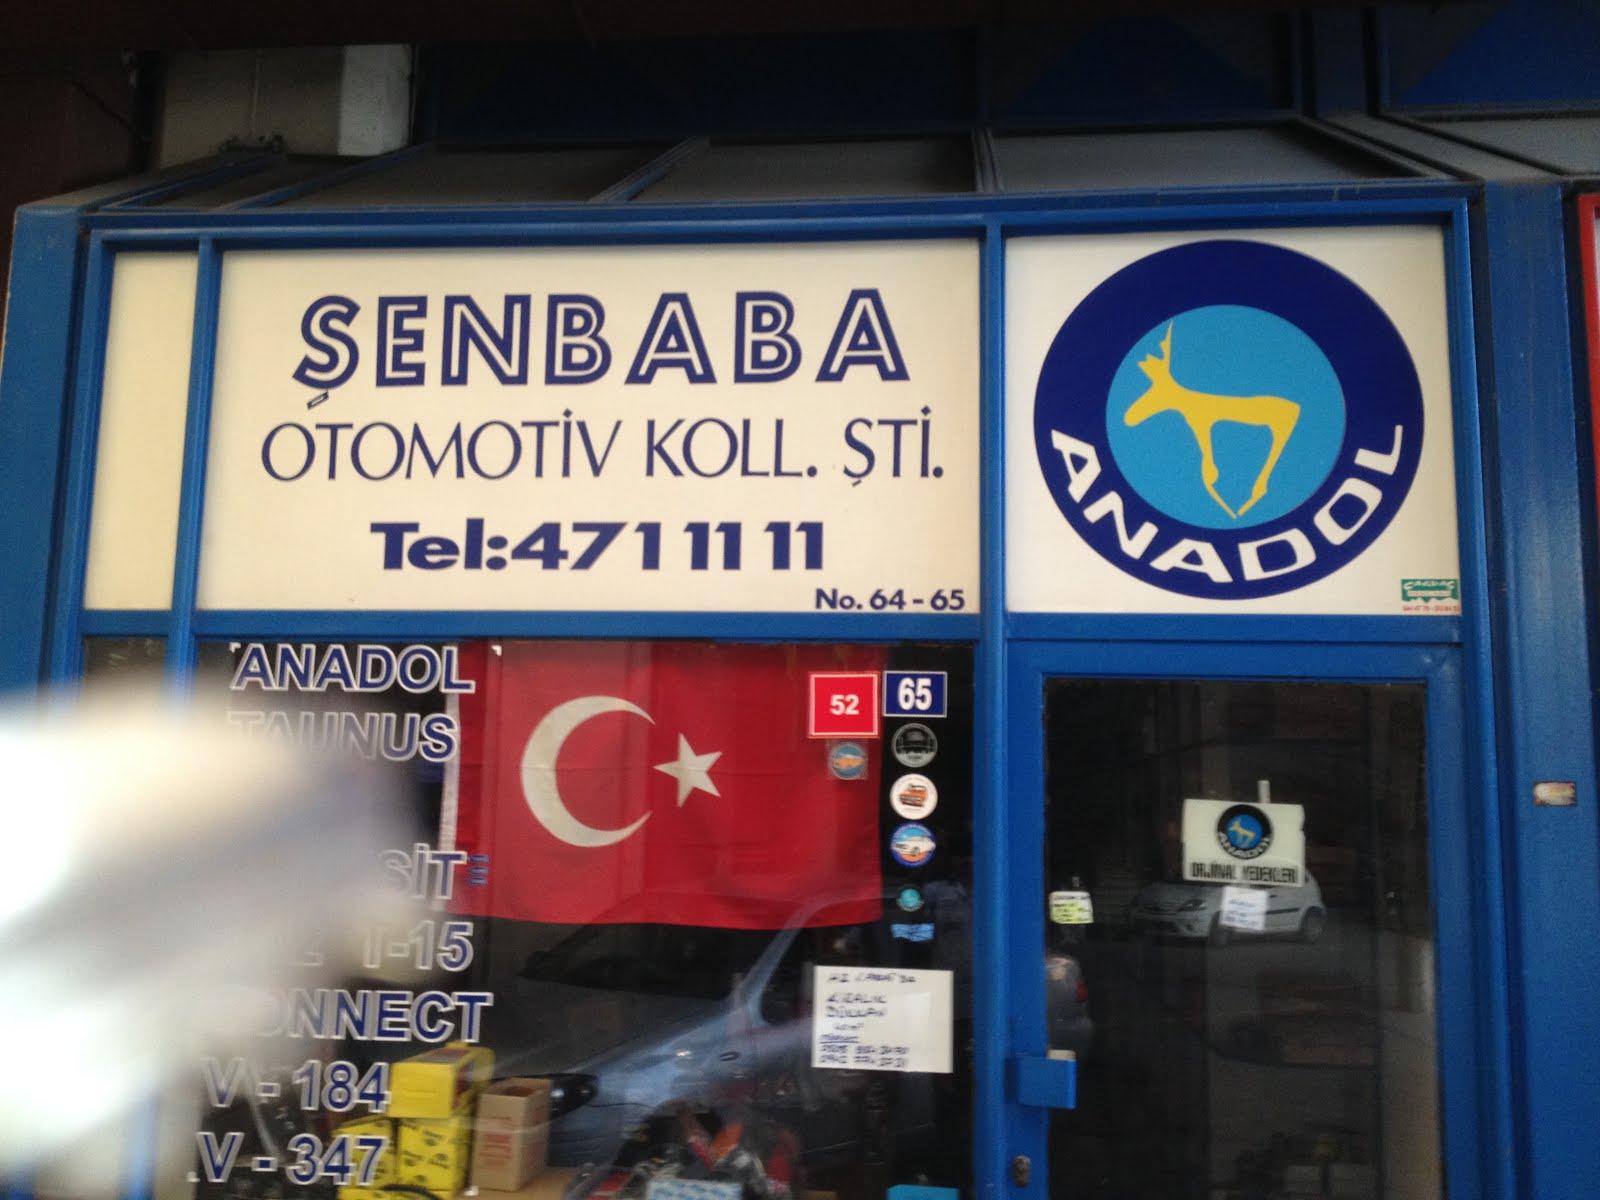 ŞENBABA OTOMOTİV KOLL ŞTİ